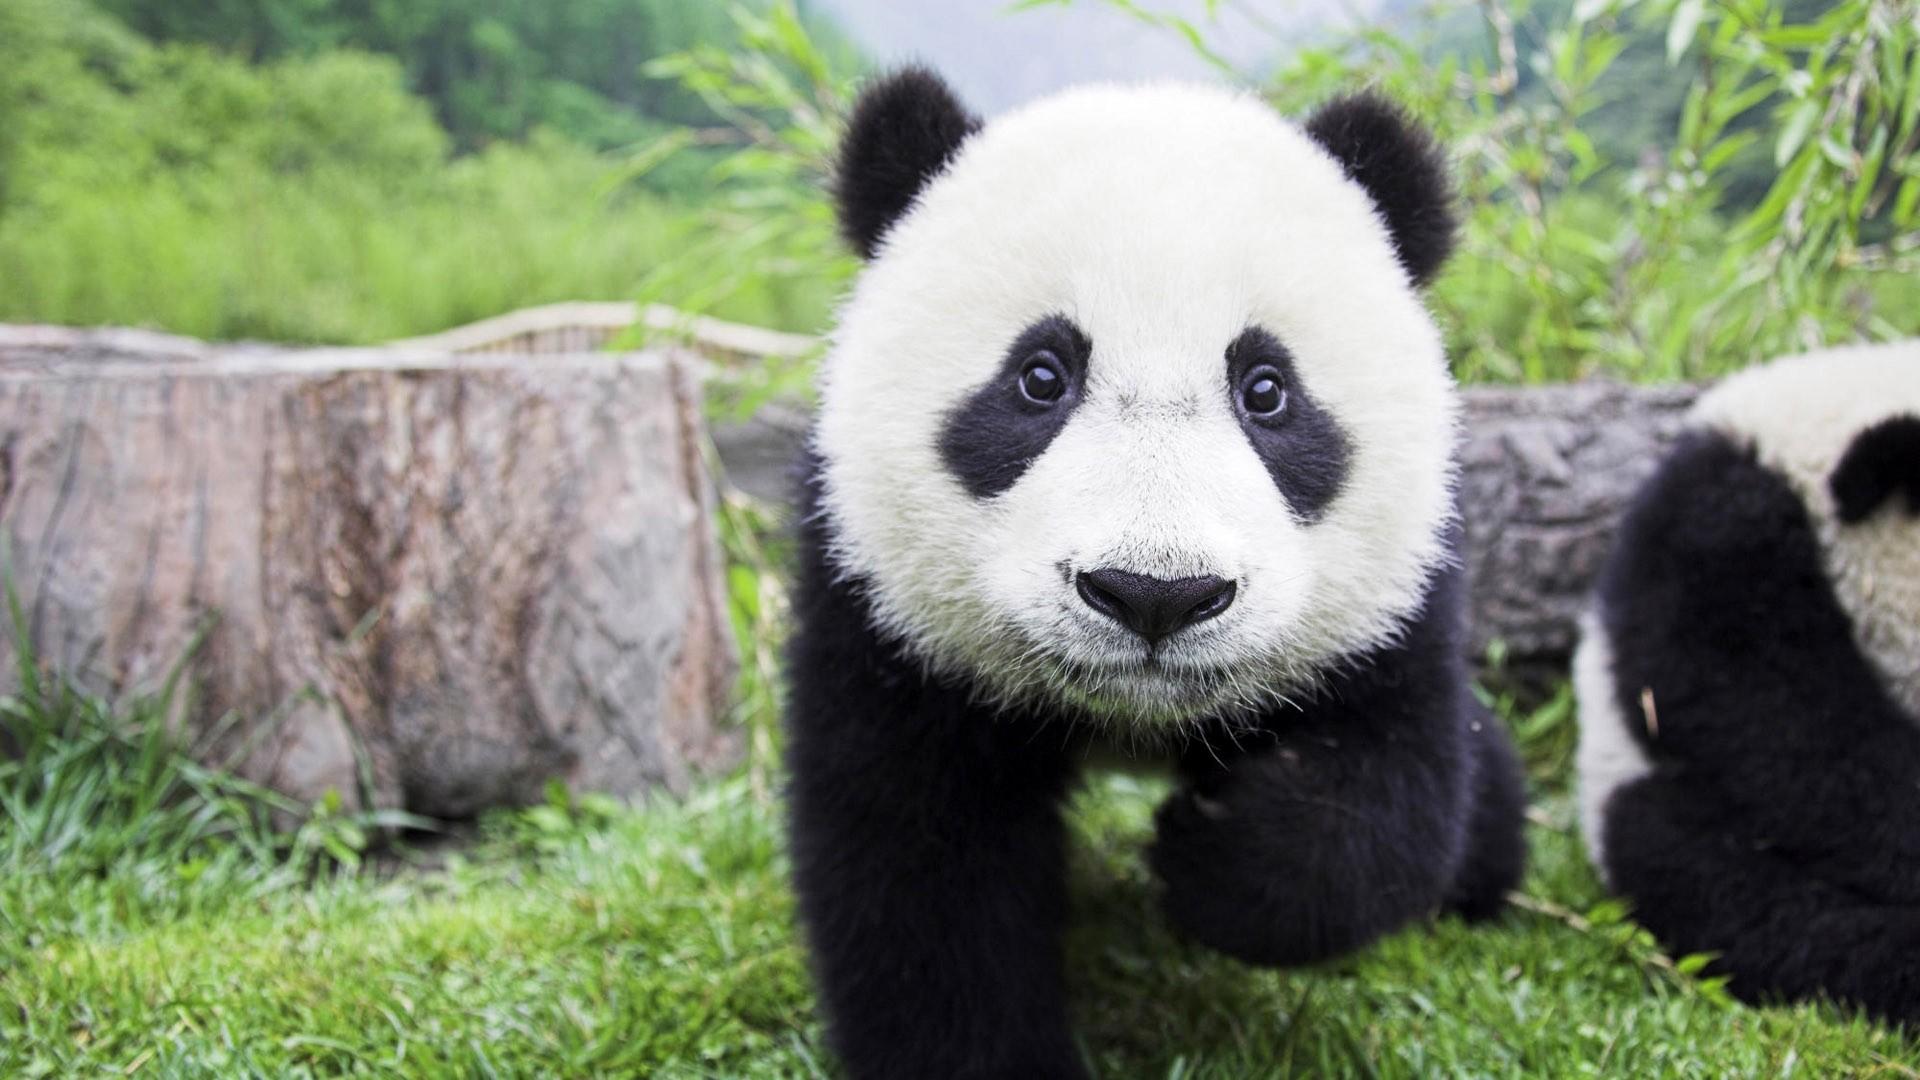 大�y�9�%9�._壁纸 大熊猫 动物 1920_1080